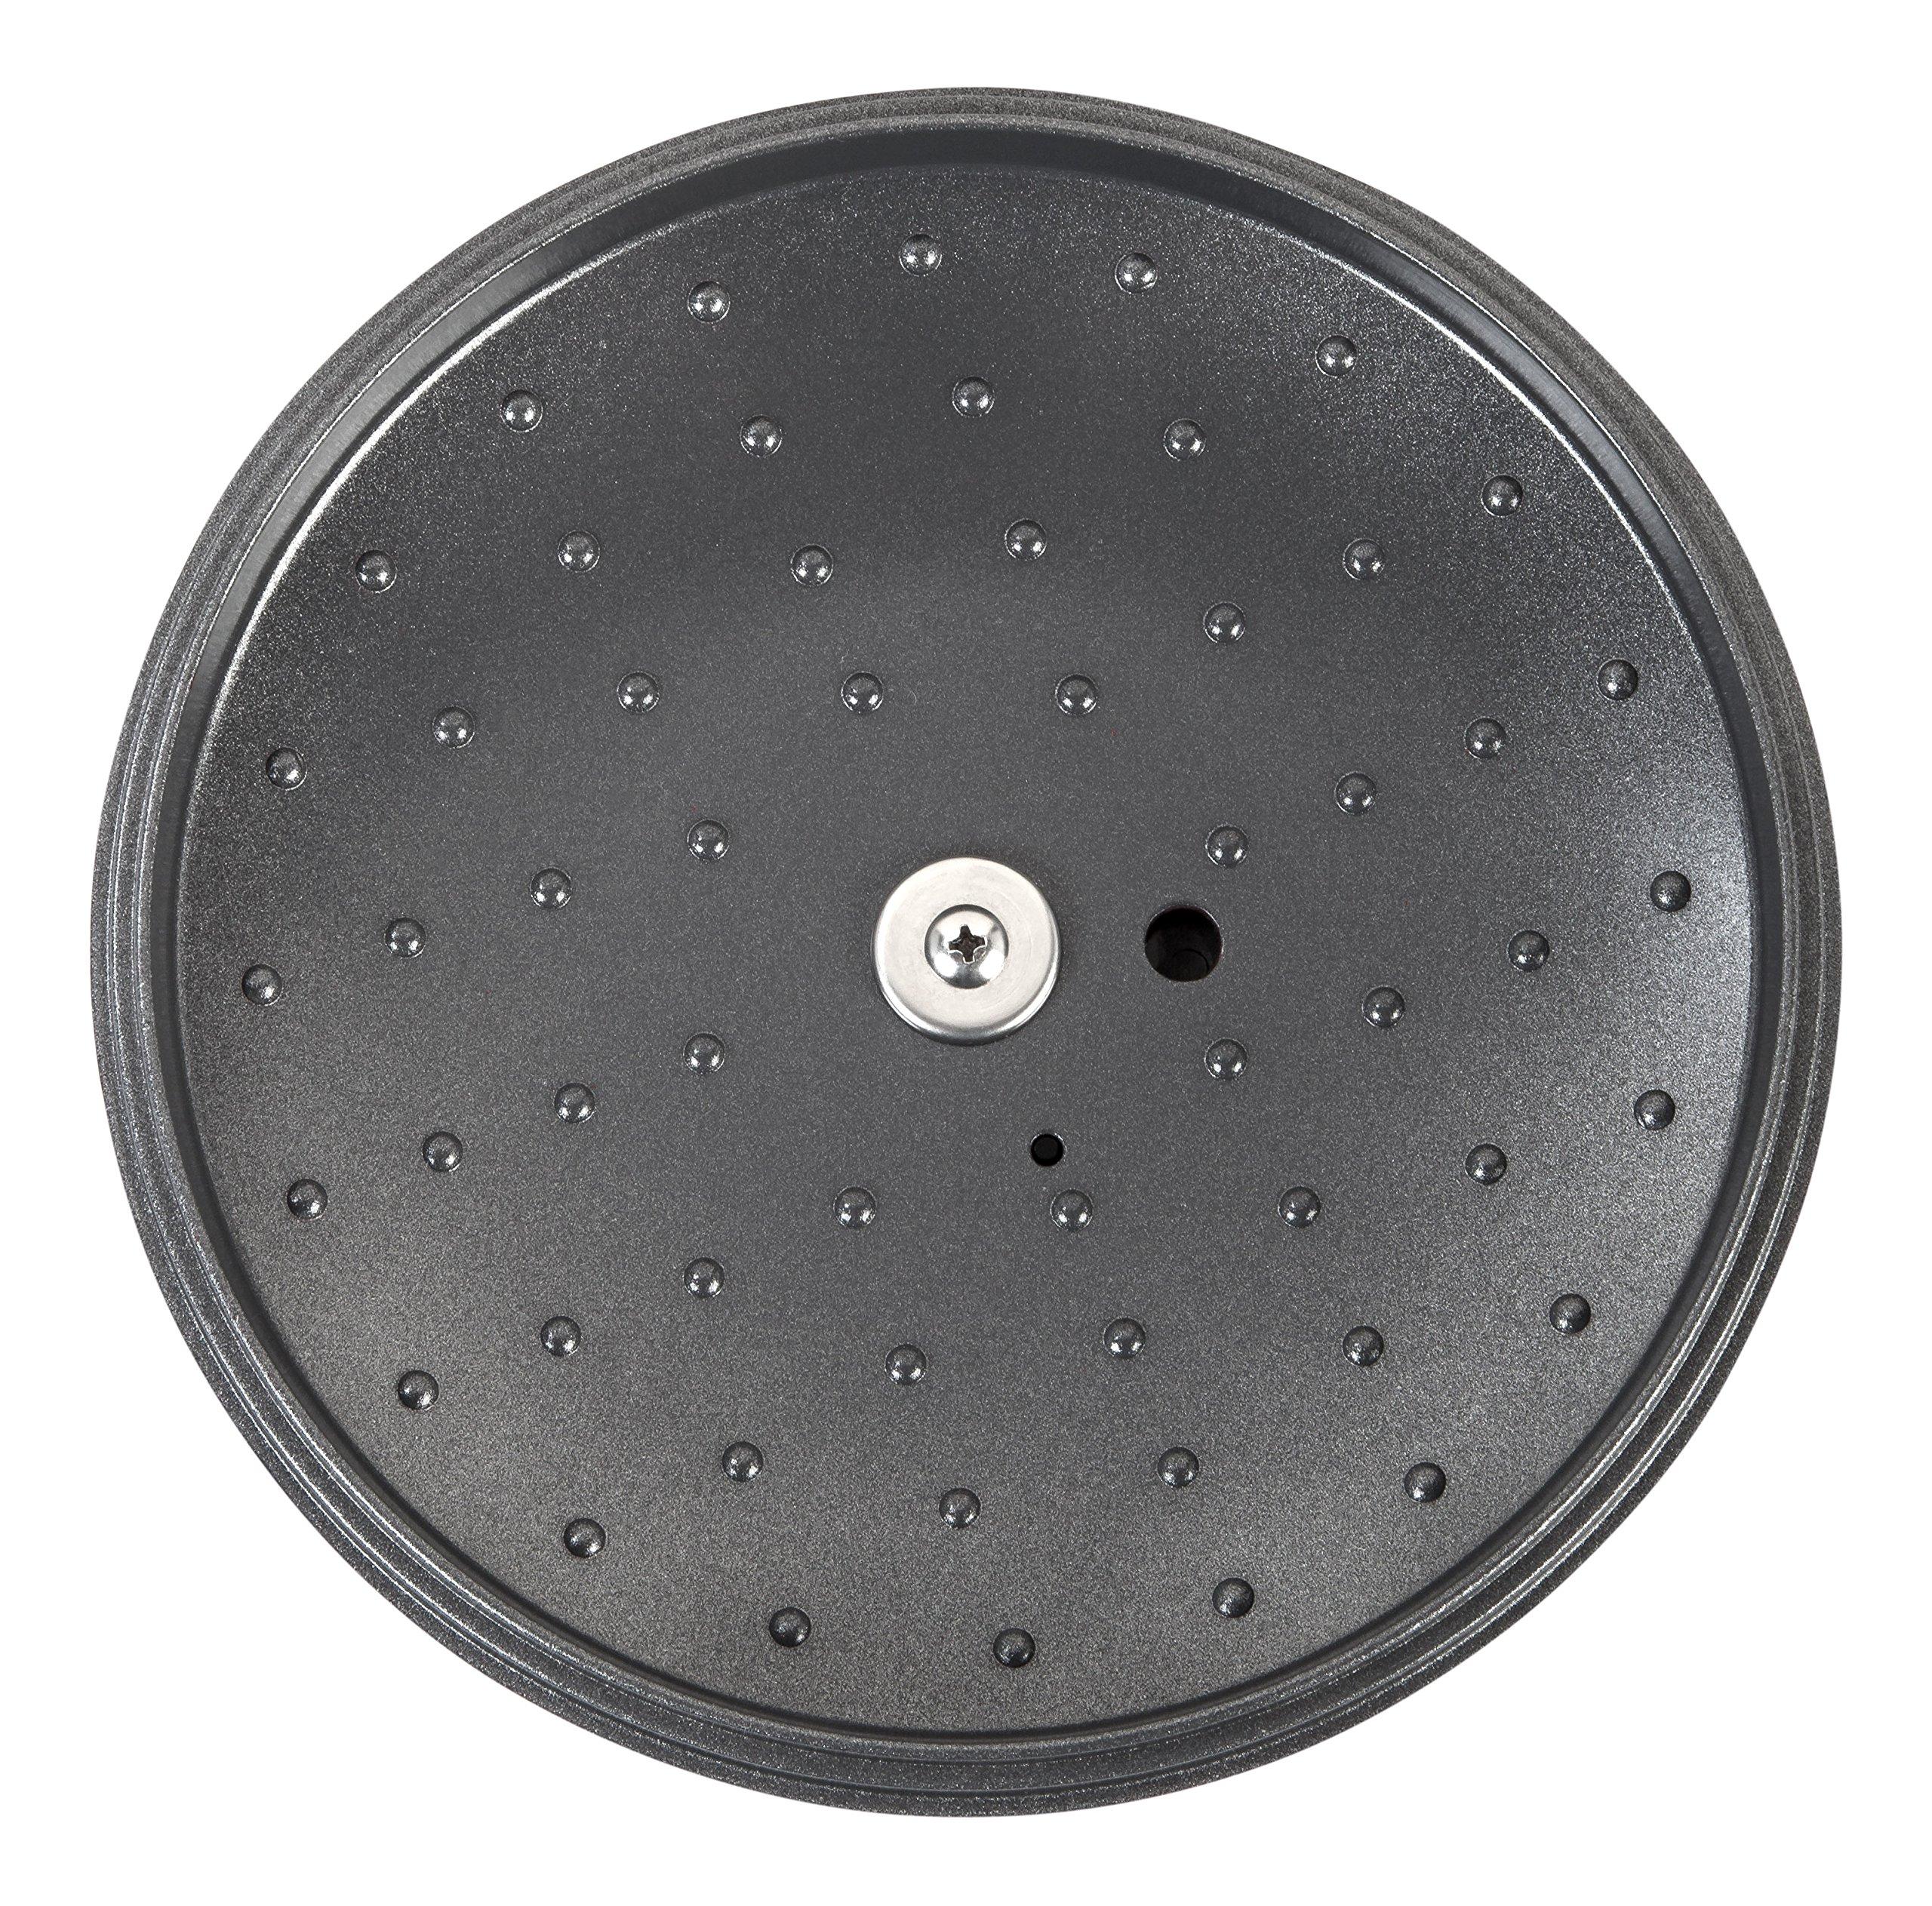 MAKER Homeware 3 QT Cast Aluminum Dutch Oven with Nonstick Ceramic Coating, Bronze by IRIS USA, Inc. (Image #5)